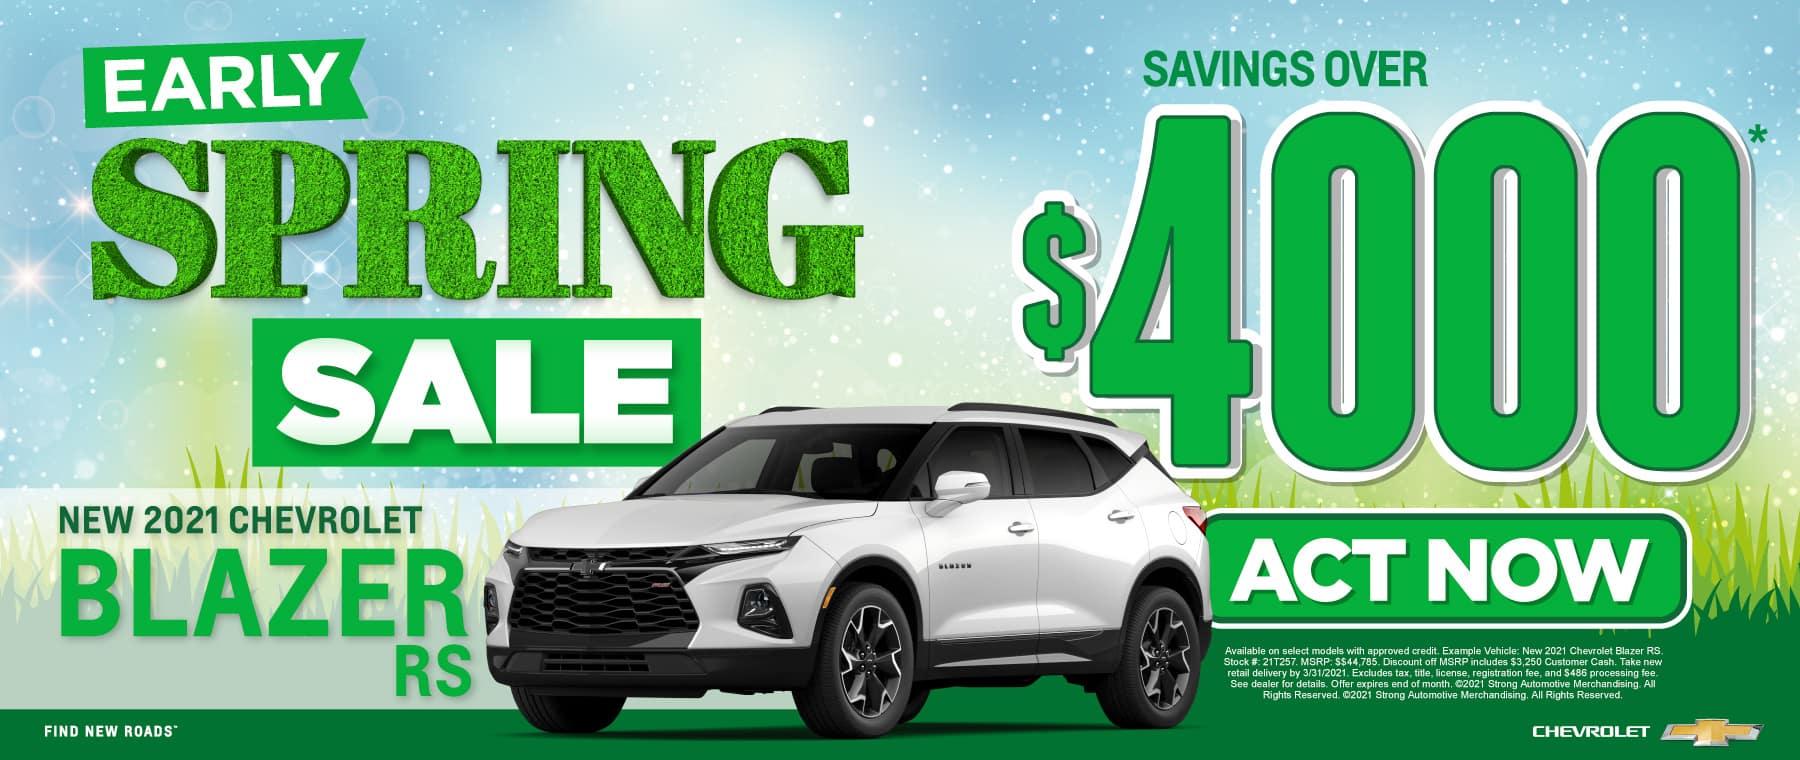 New 2021 Chevy Blazer - Savings of $4000 - Act Now